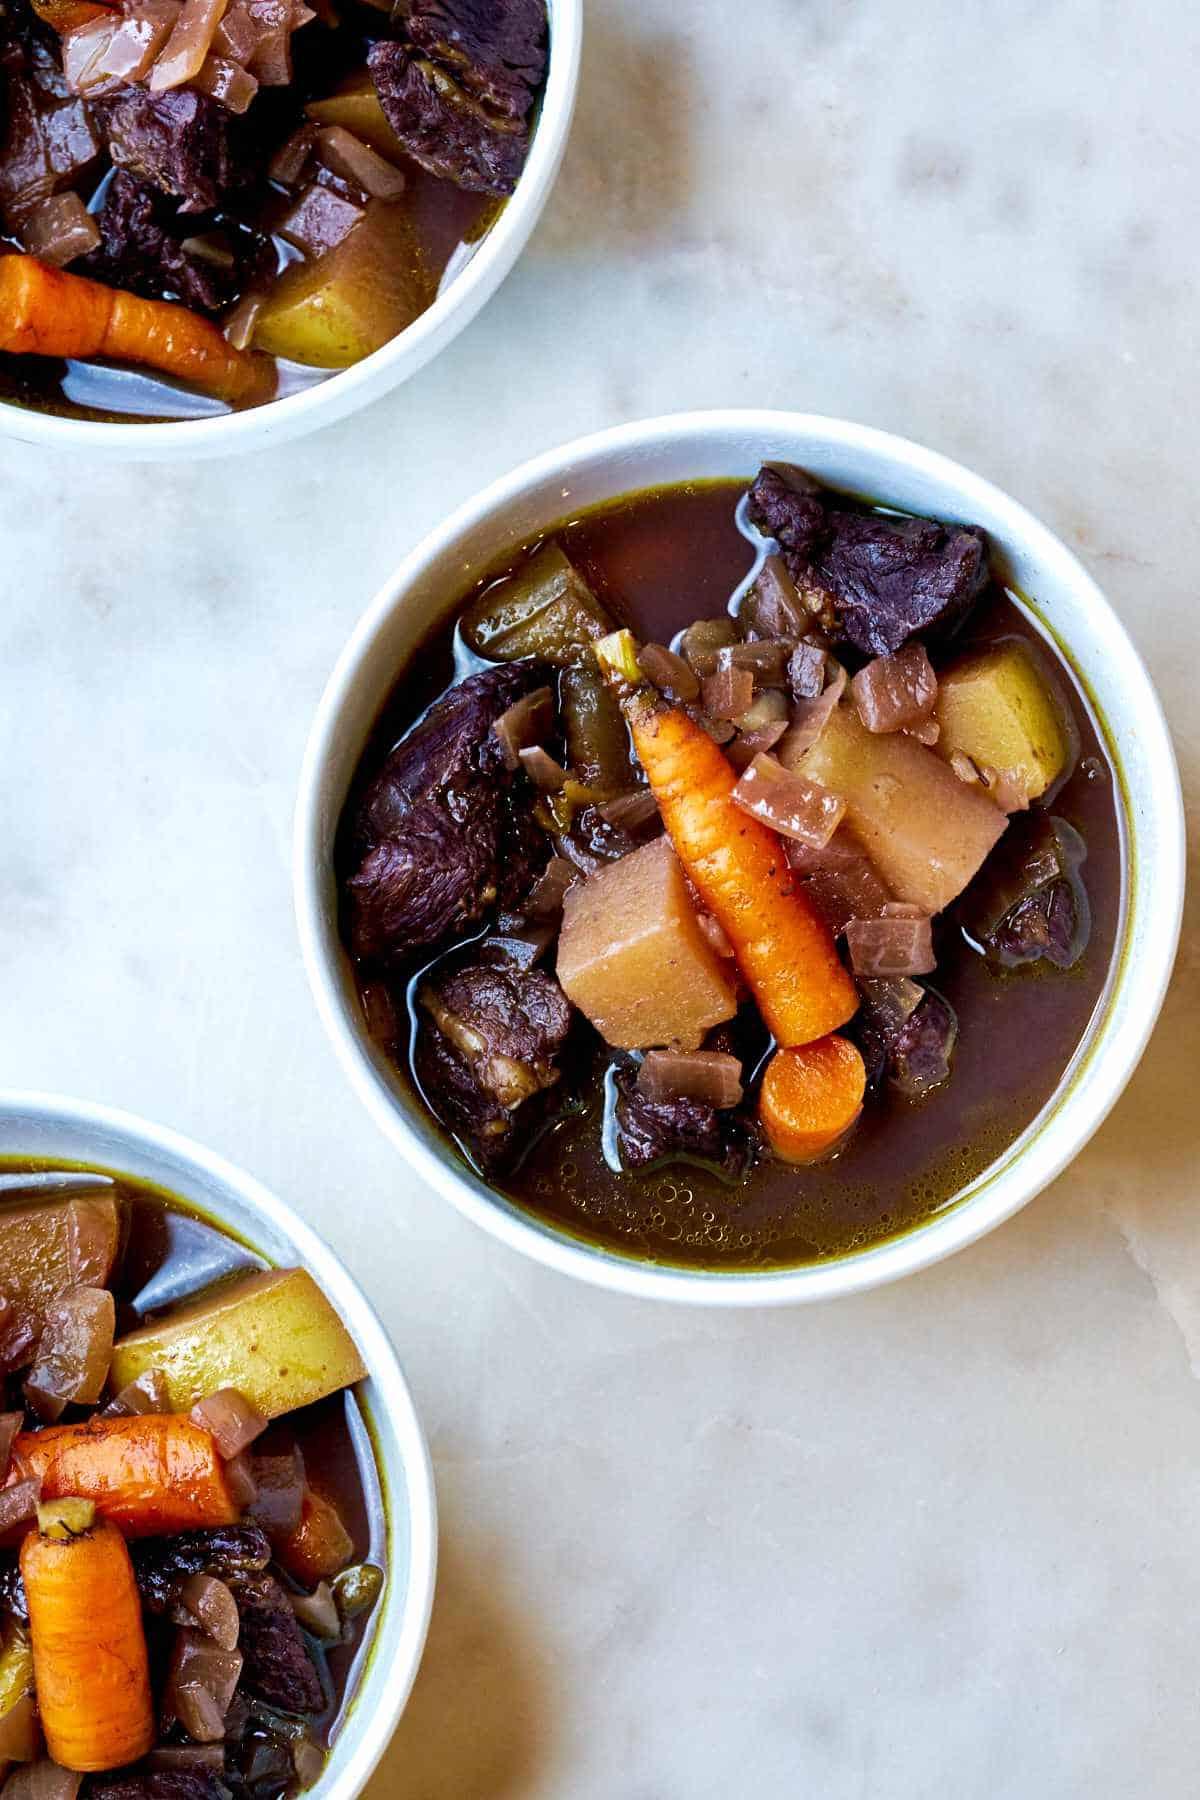 Three bowls of beef stew.